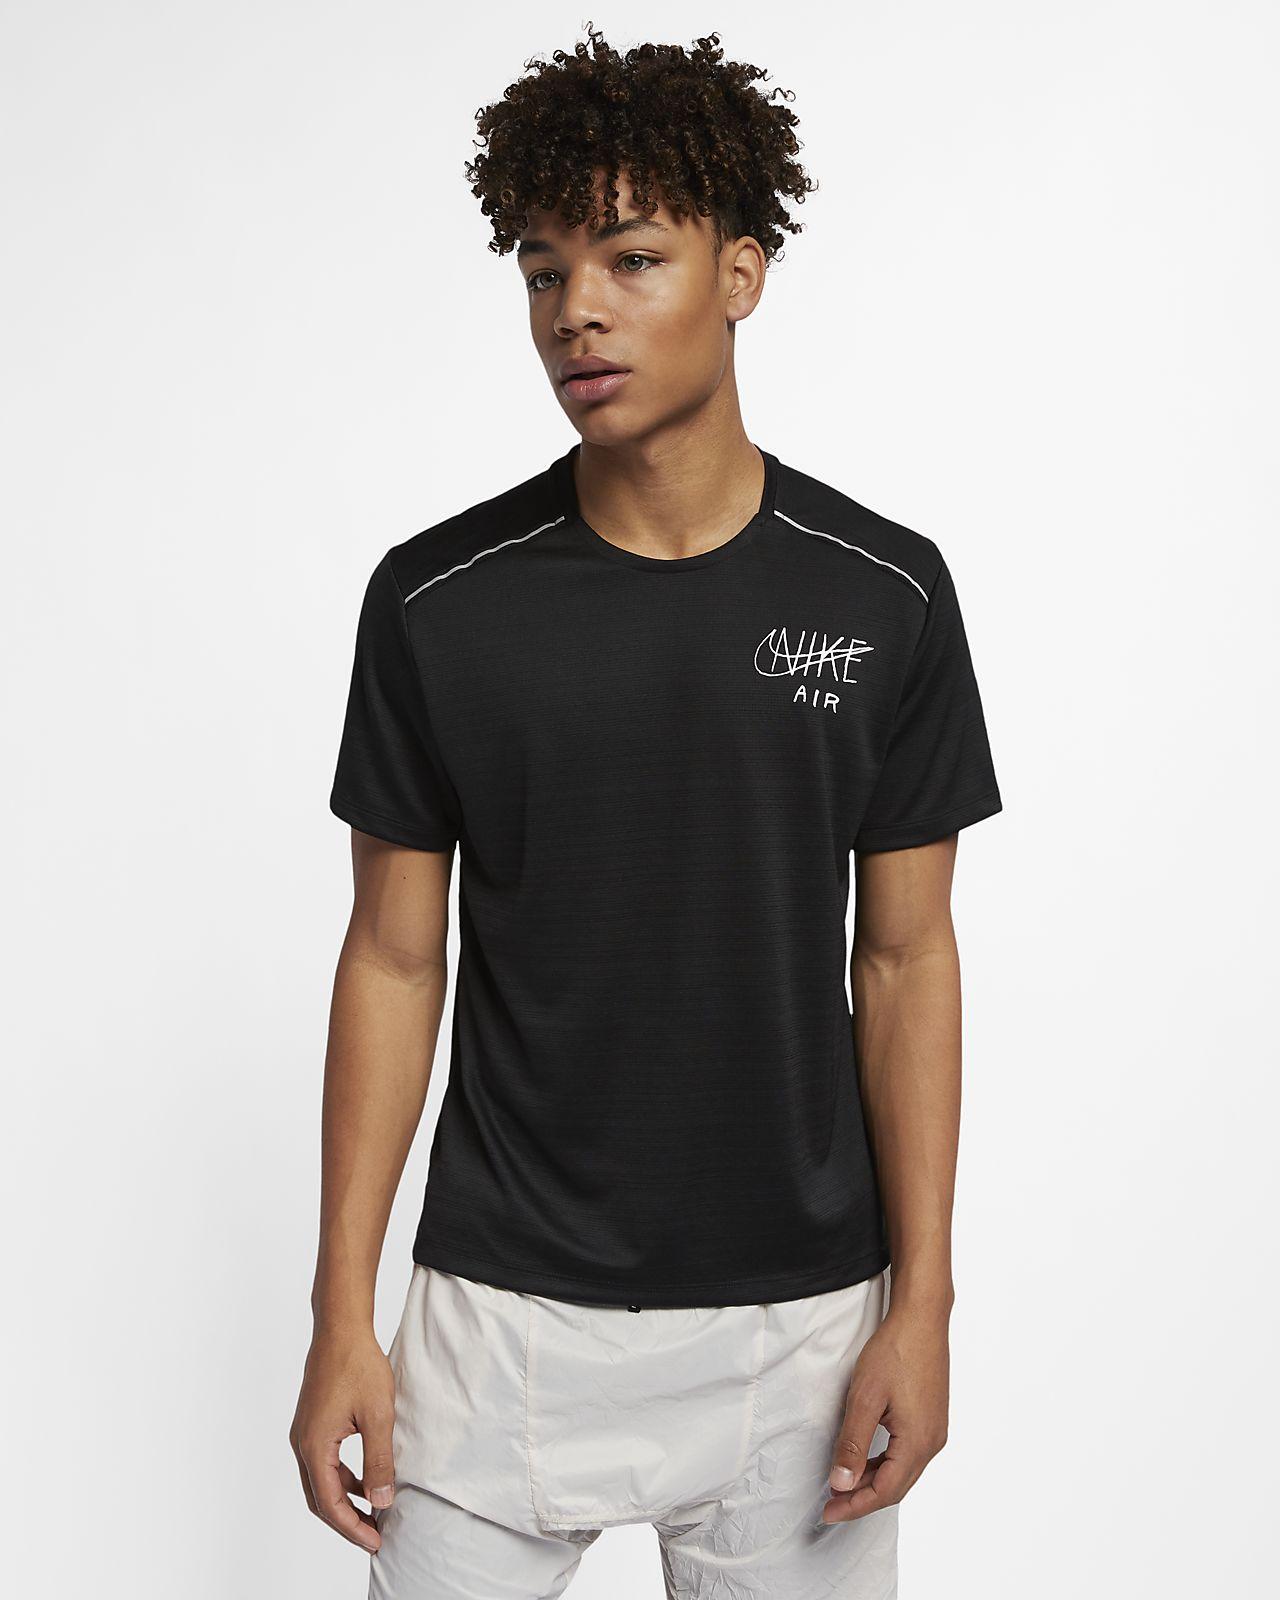 abbdc07f59 Nike Dri-FIT Miler Camiseta de manga corta con estampado de running - Hombre